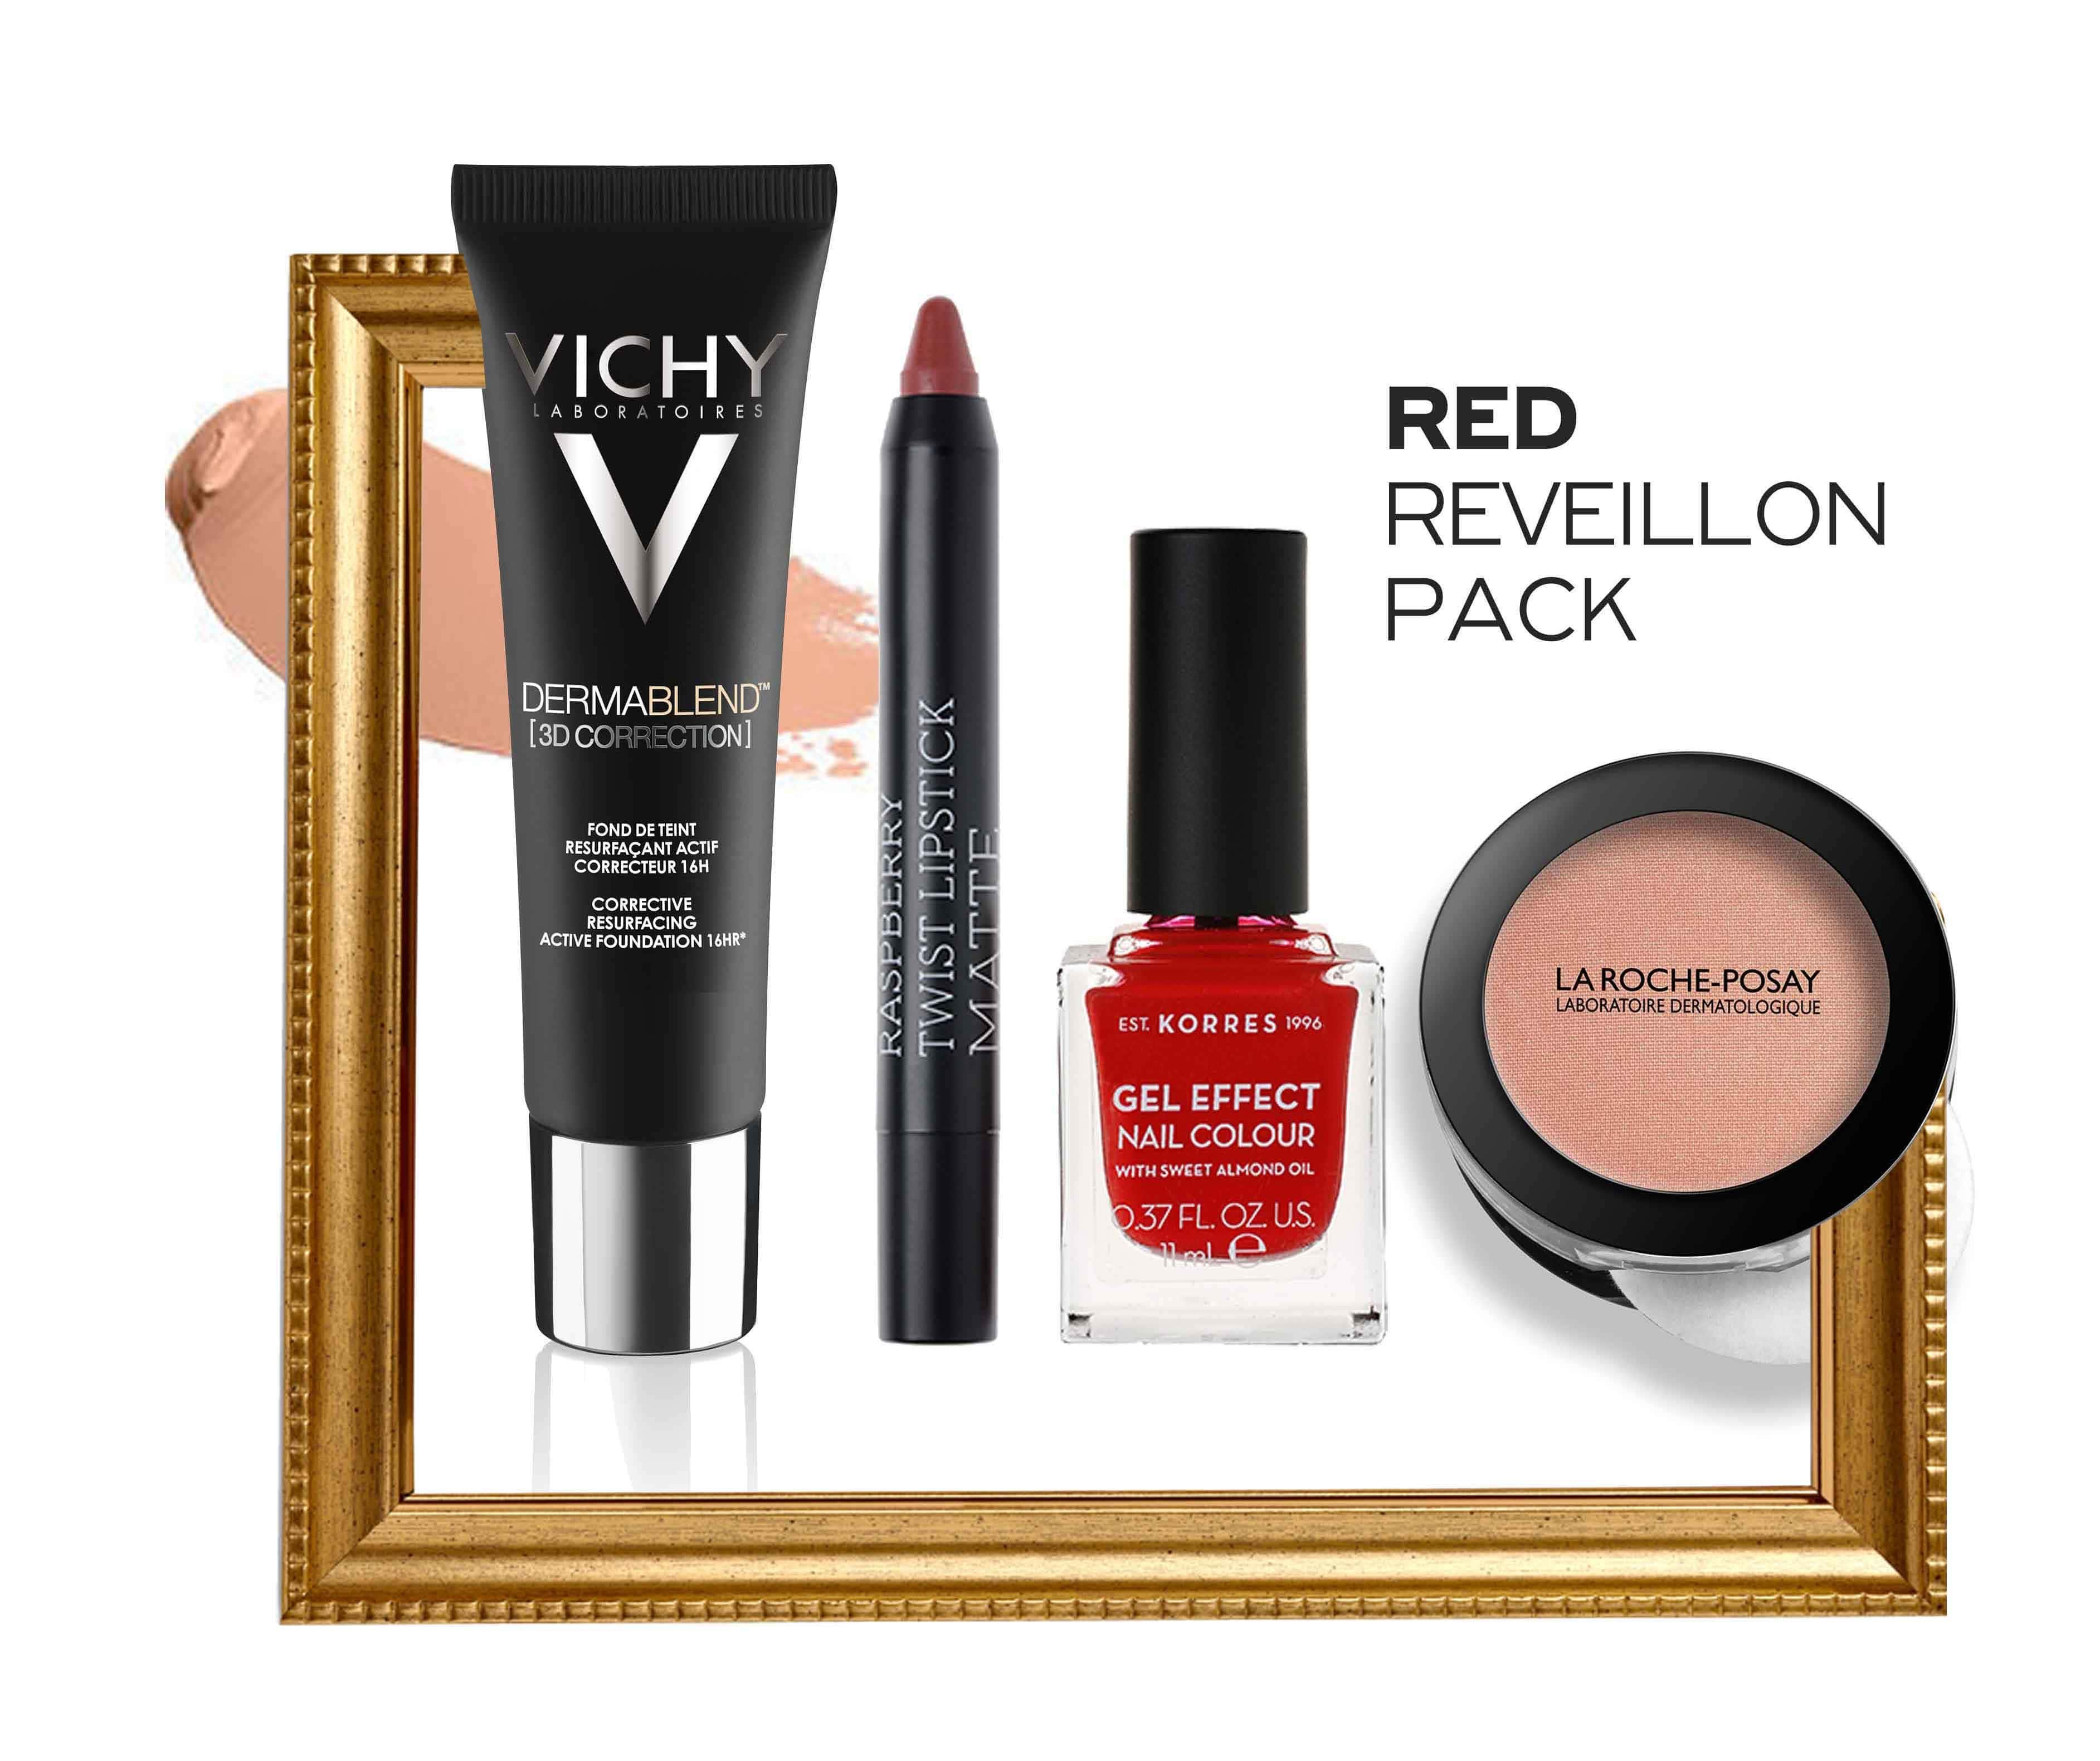 Red Reveillon Pack με Vichy Dermablend 3D Make Up, 30ml, Korres Twist Lipstick Matte Ruby Red Ματ Κραγιόν, 1.5ml, Korres Gel Effect Nail Colour No.53 Royal Red Βερνίκι Νυχιών, 11ml & La Roche Posay Toleriane Teint Blush No. 02 Ρουζ, 5gr